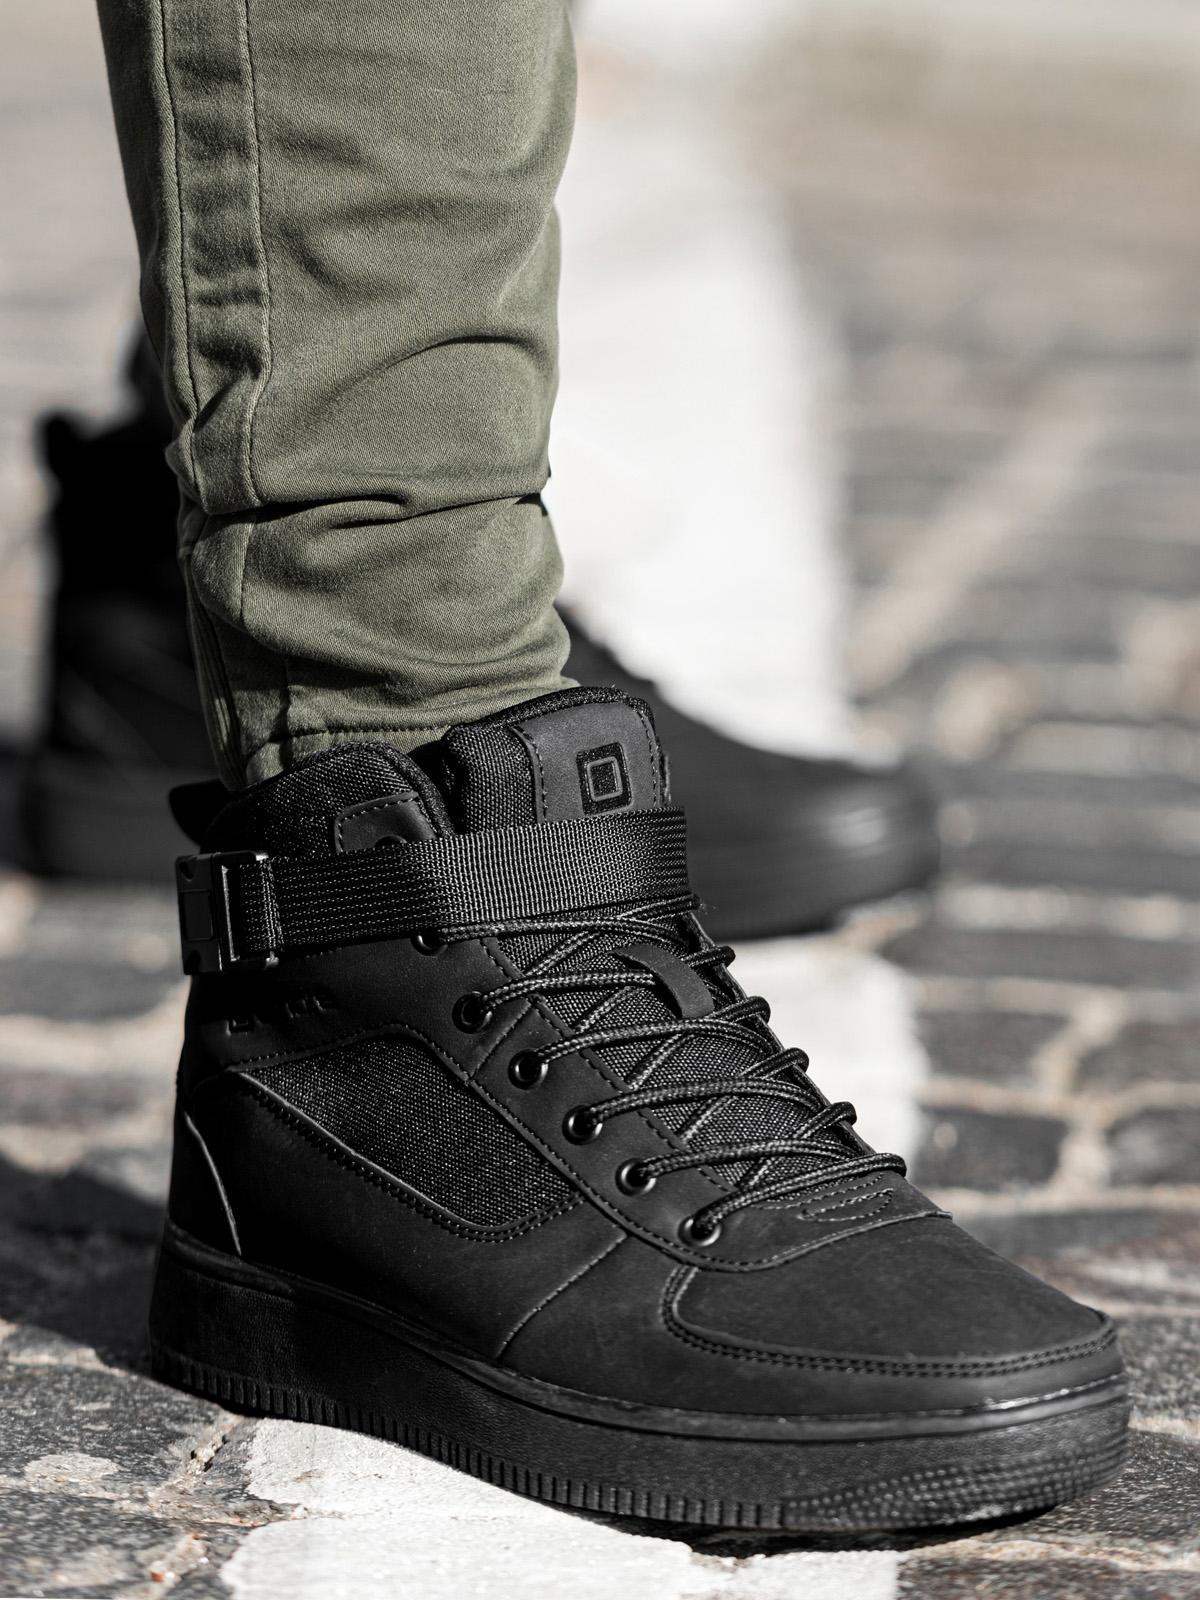 Buty męskie sneakersy T317 czarne Sklep Ombre.pl